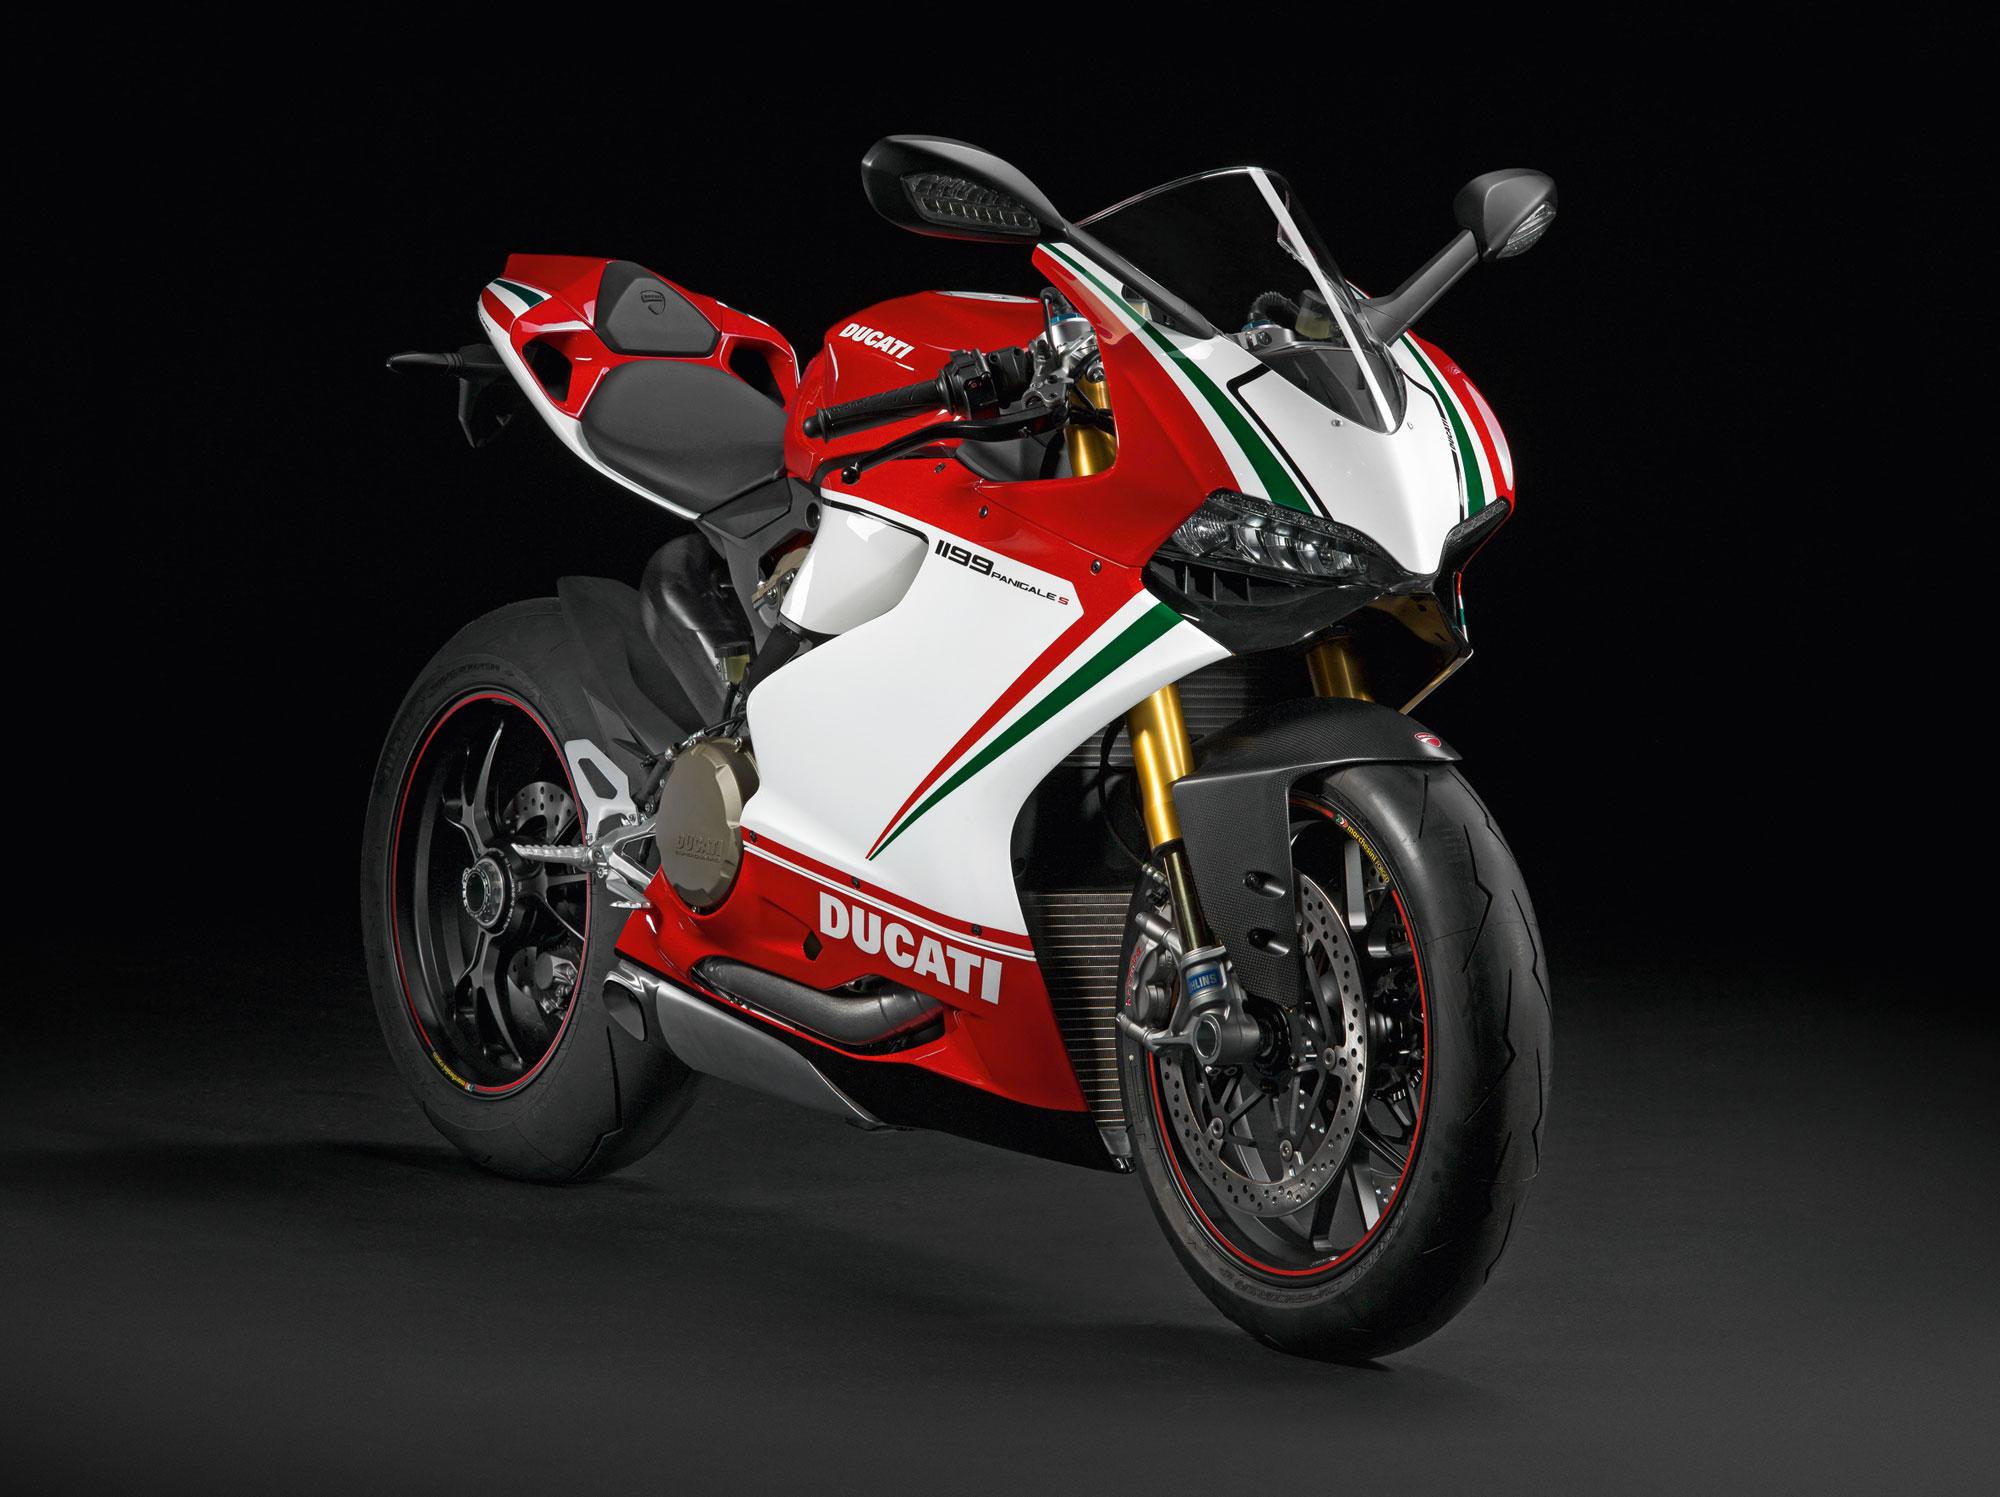 2012 Ducati 1199 Panigale S K Wallpaper